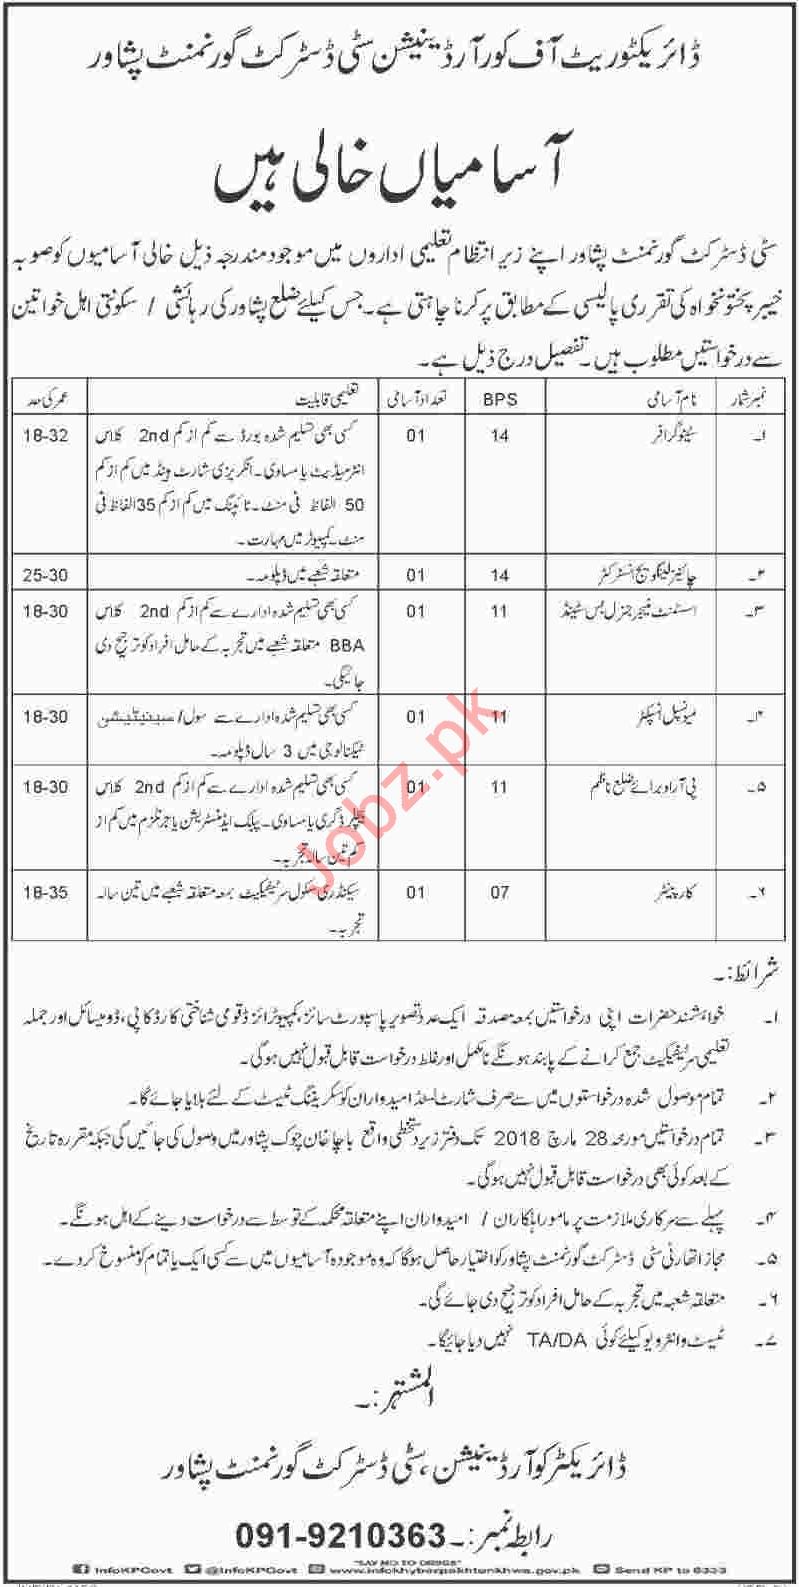 Directorate Of Coordination City District Govt Peshawar Jobs